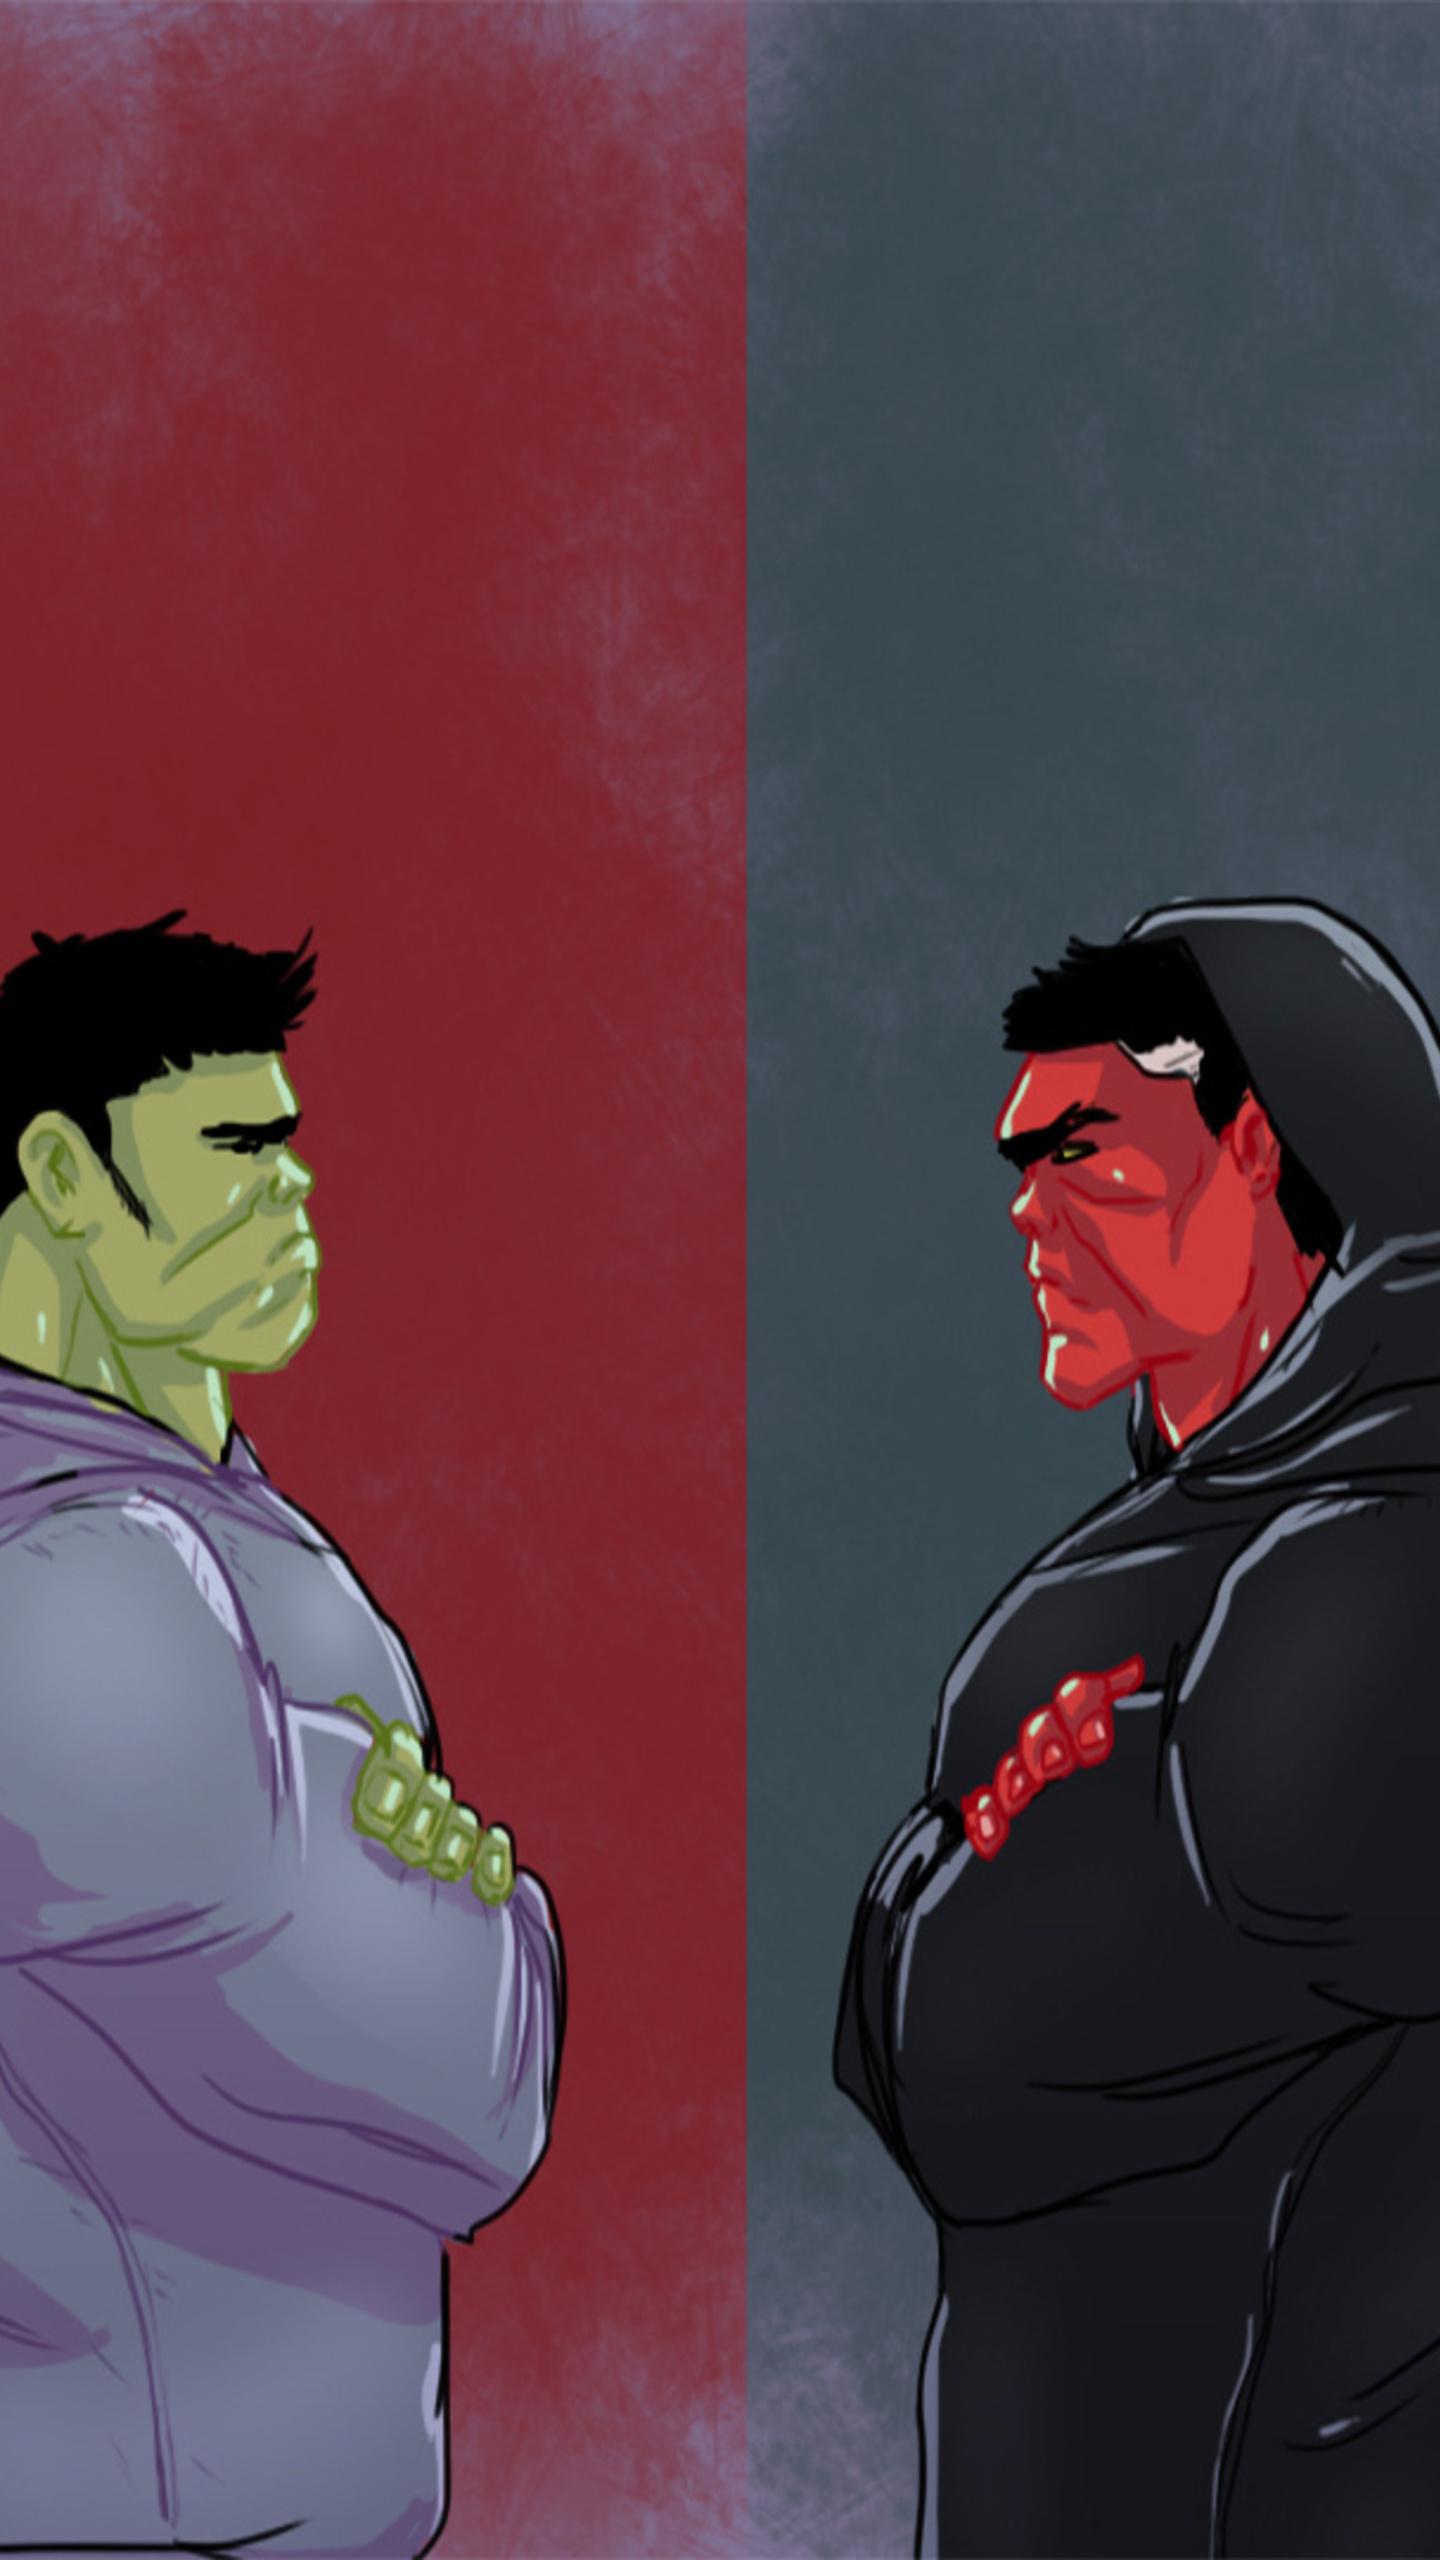 green-and-red-hulk-artwork-91.jpg